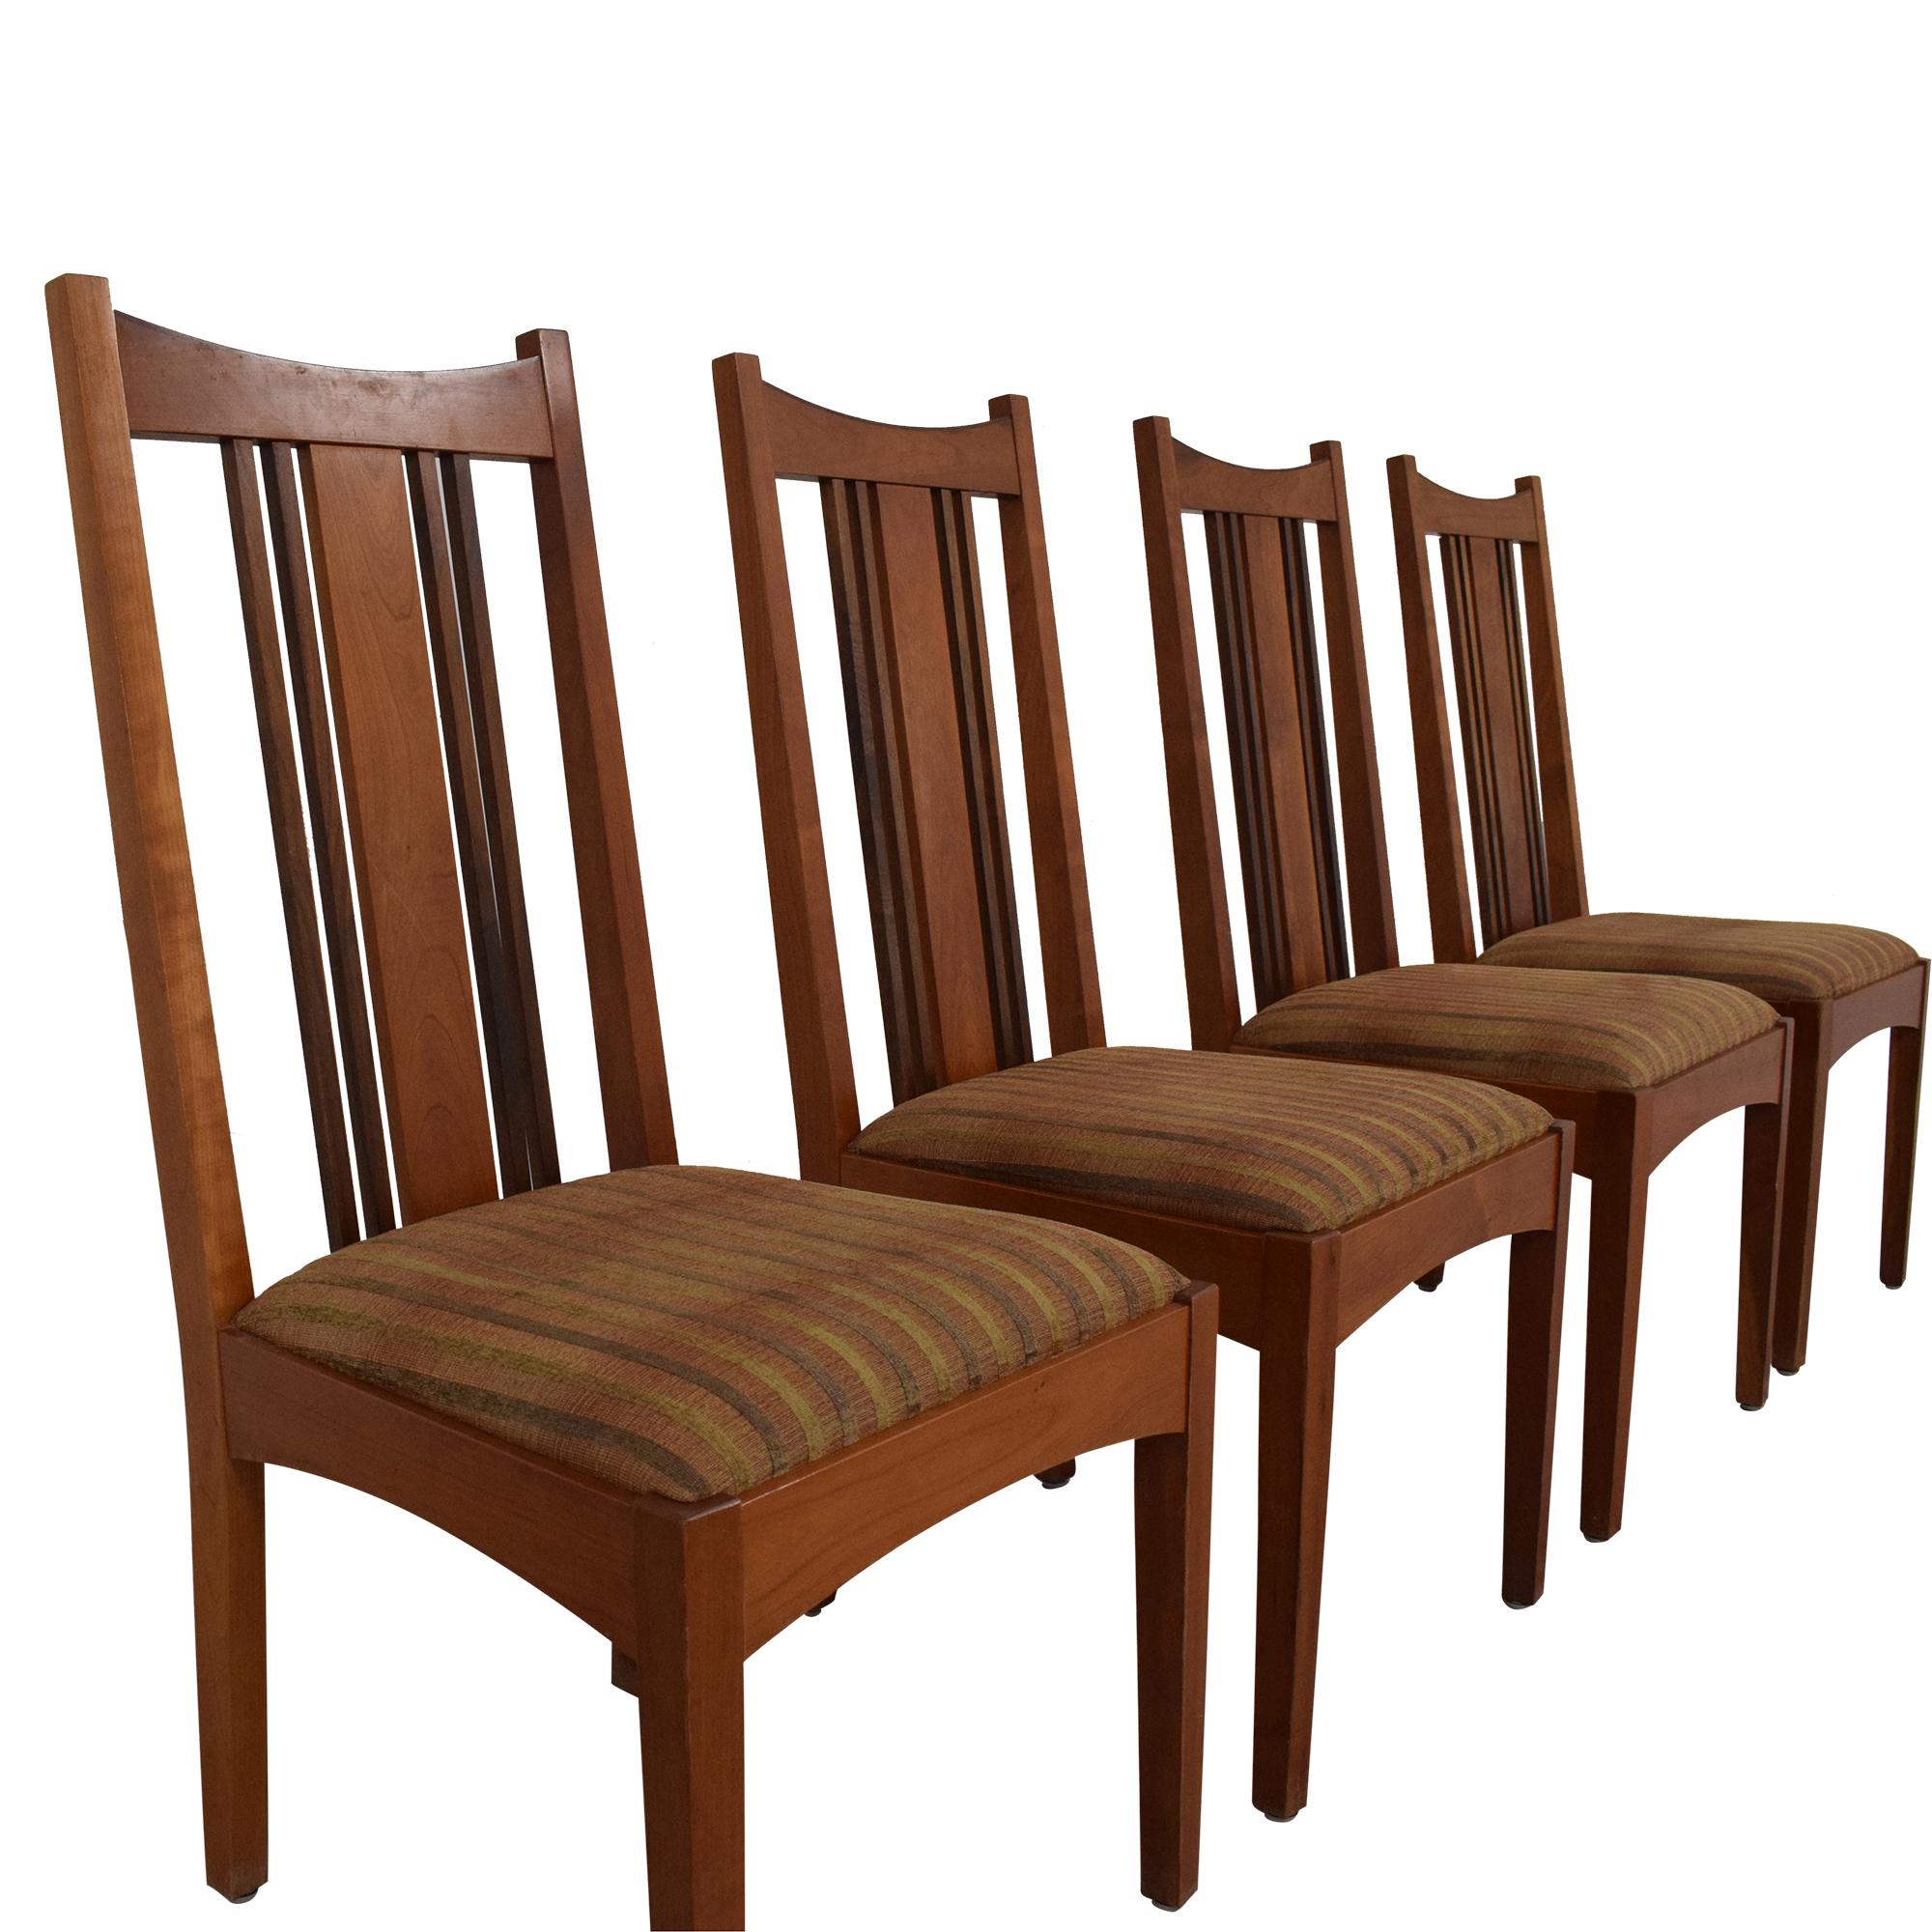 Stickley Furniture Stickley Furniture Metropolitan Side Chair used